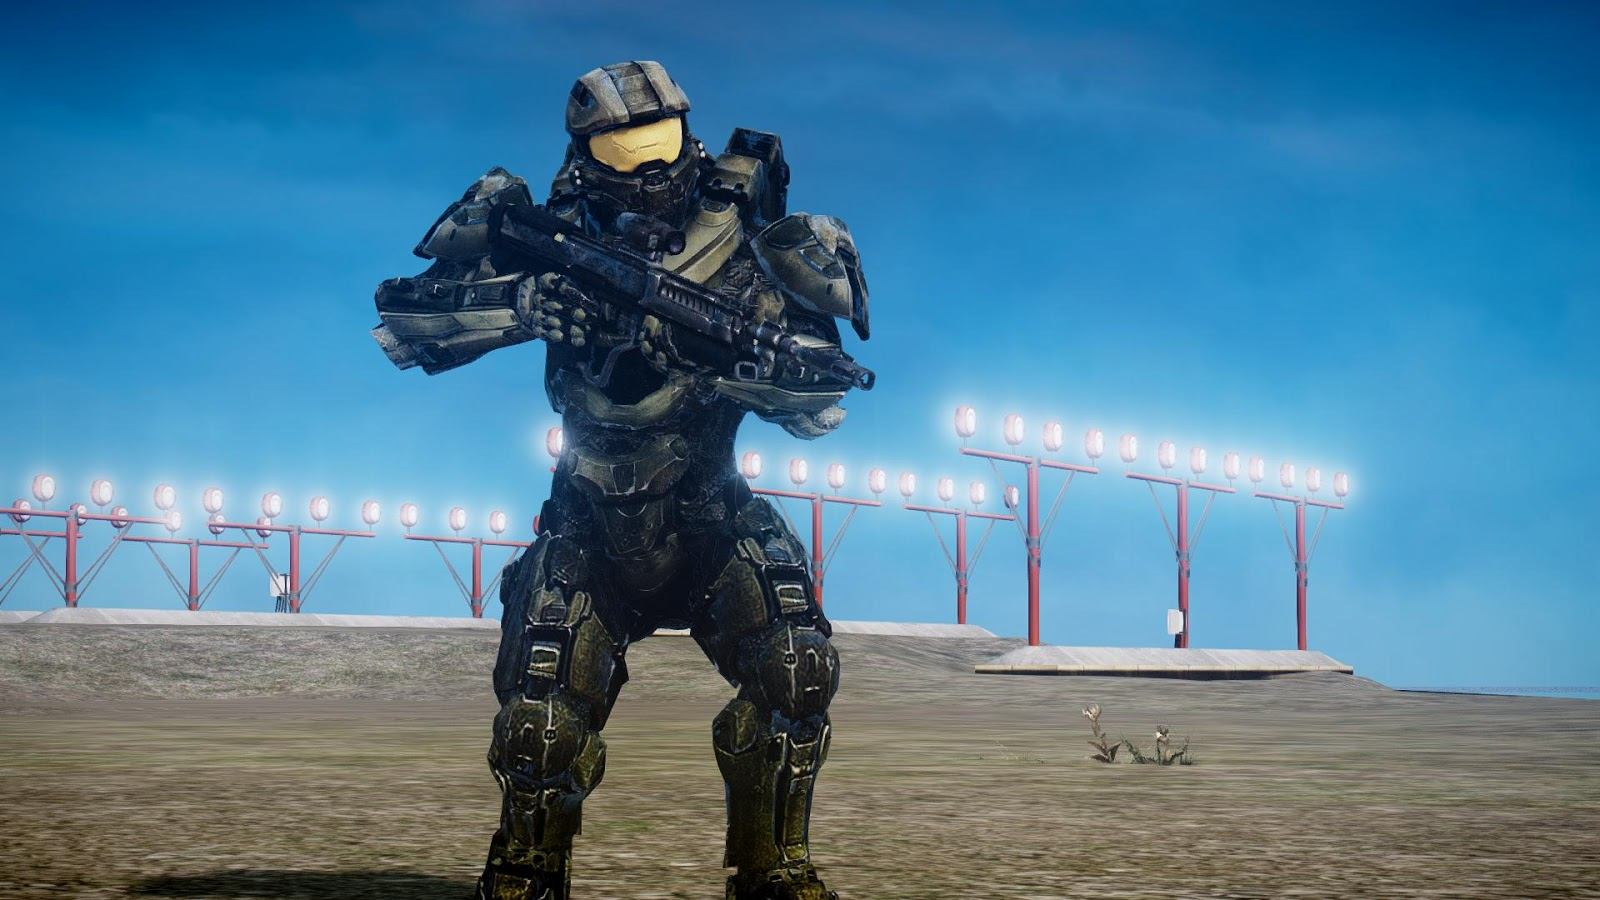 Halo 4 elite mod